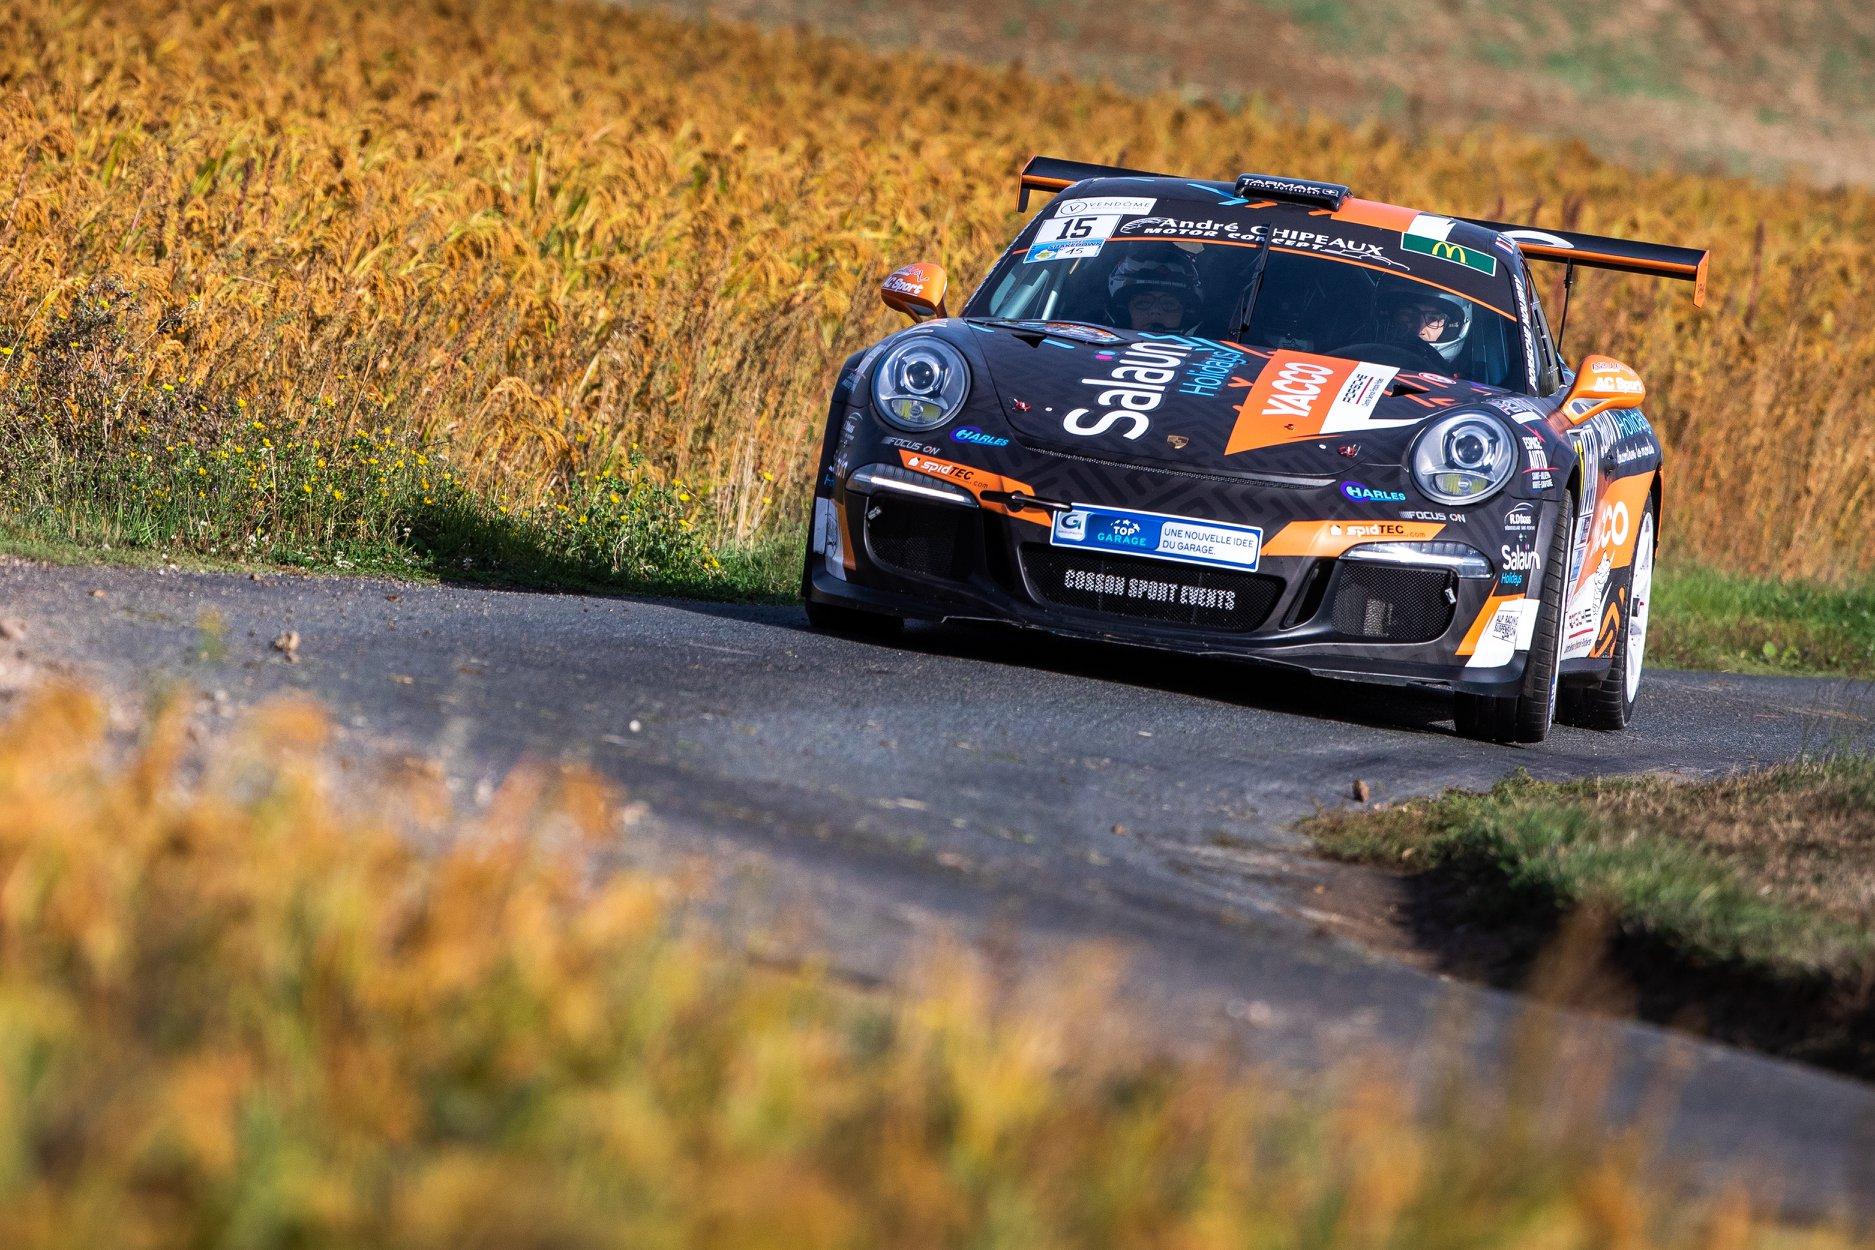 La Porsche 991 GT+ au Rallye Coeur de France 2019